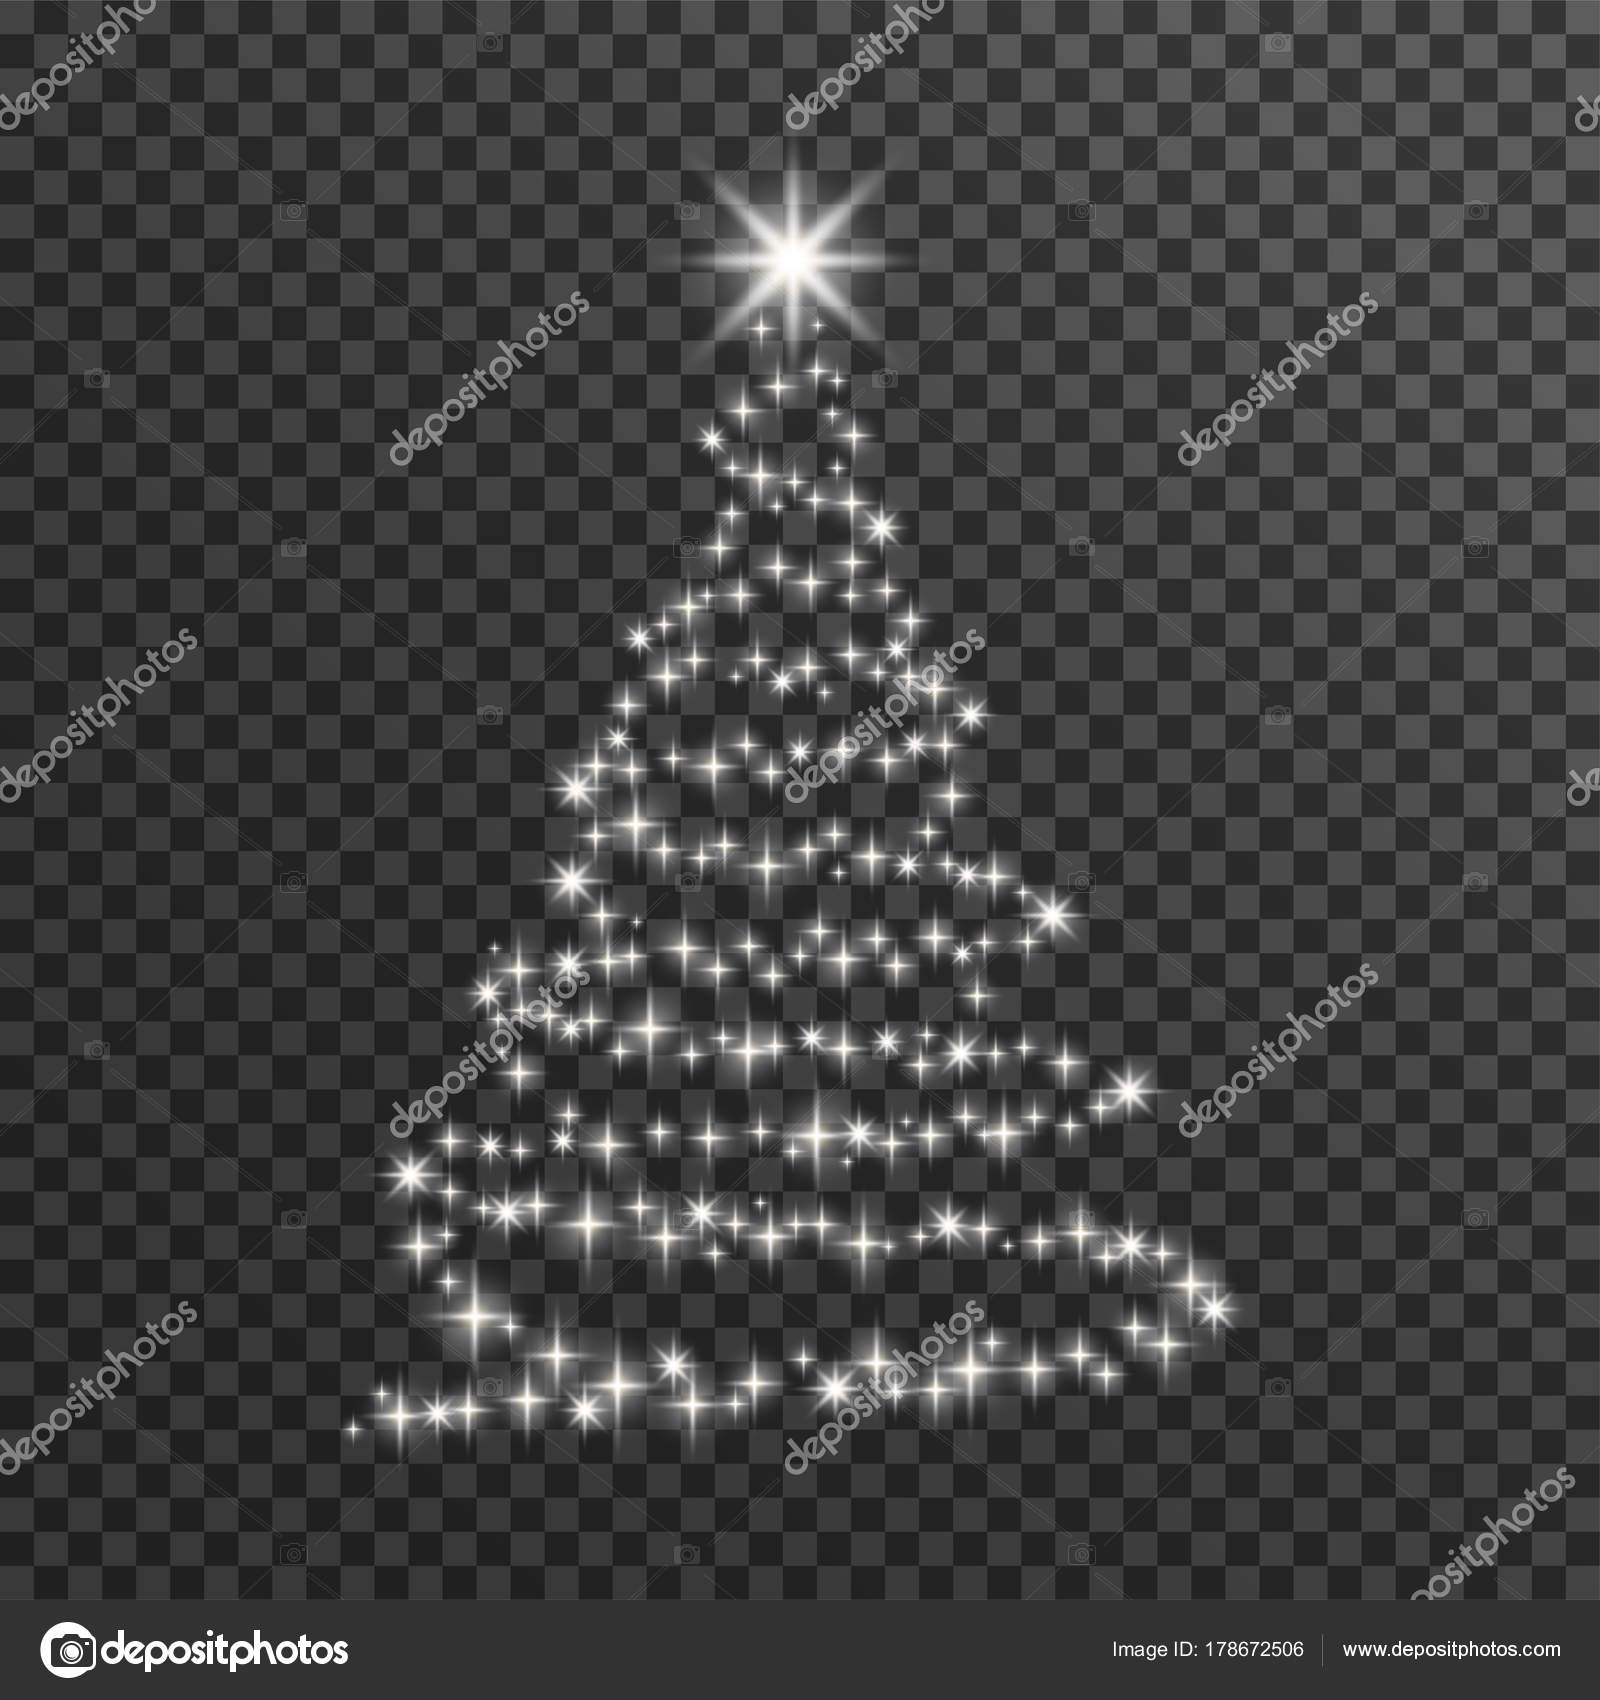 Christmas Tree Transparent Background.Christmas Tree Transparent Background Happy New Year Merry